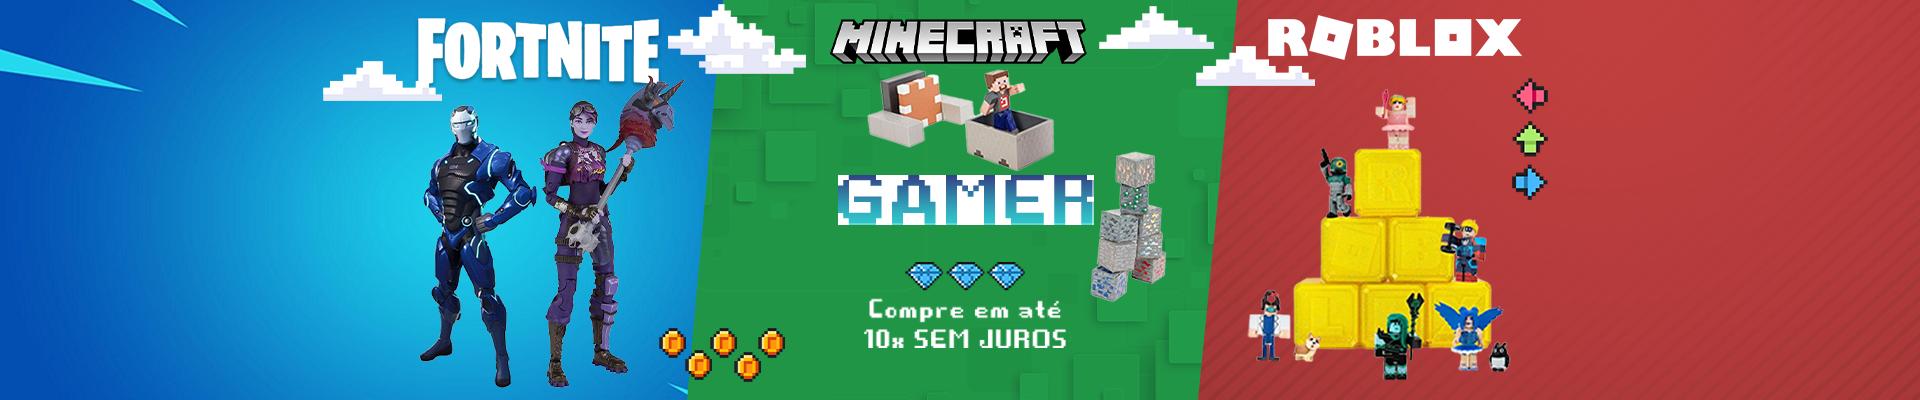 Patrulha Minecraft - Roblox - Fortnite